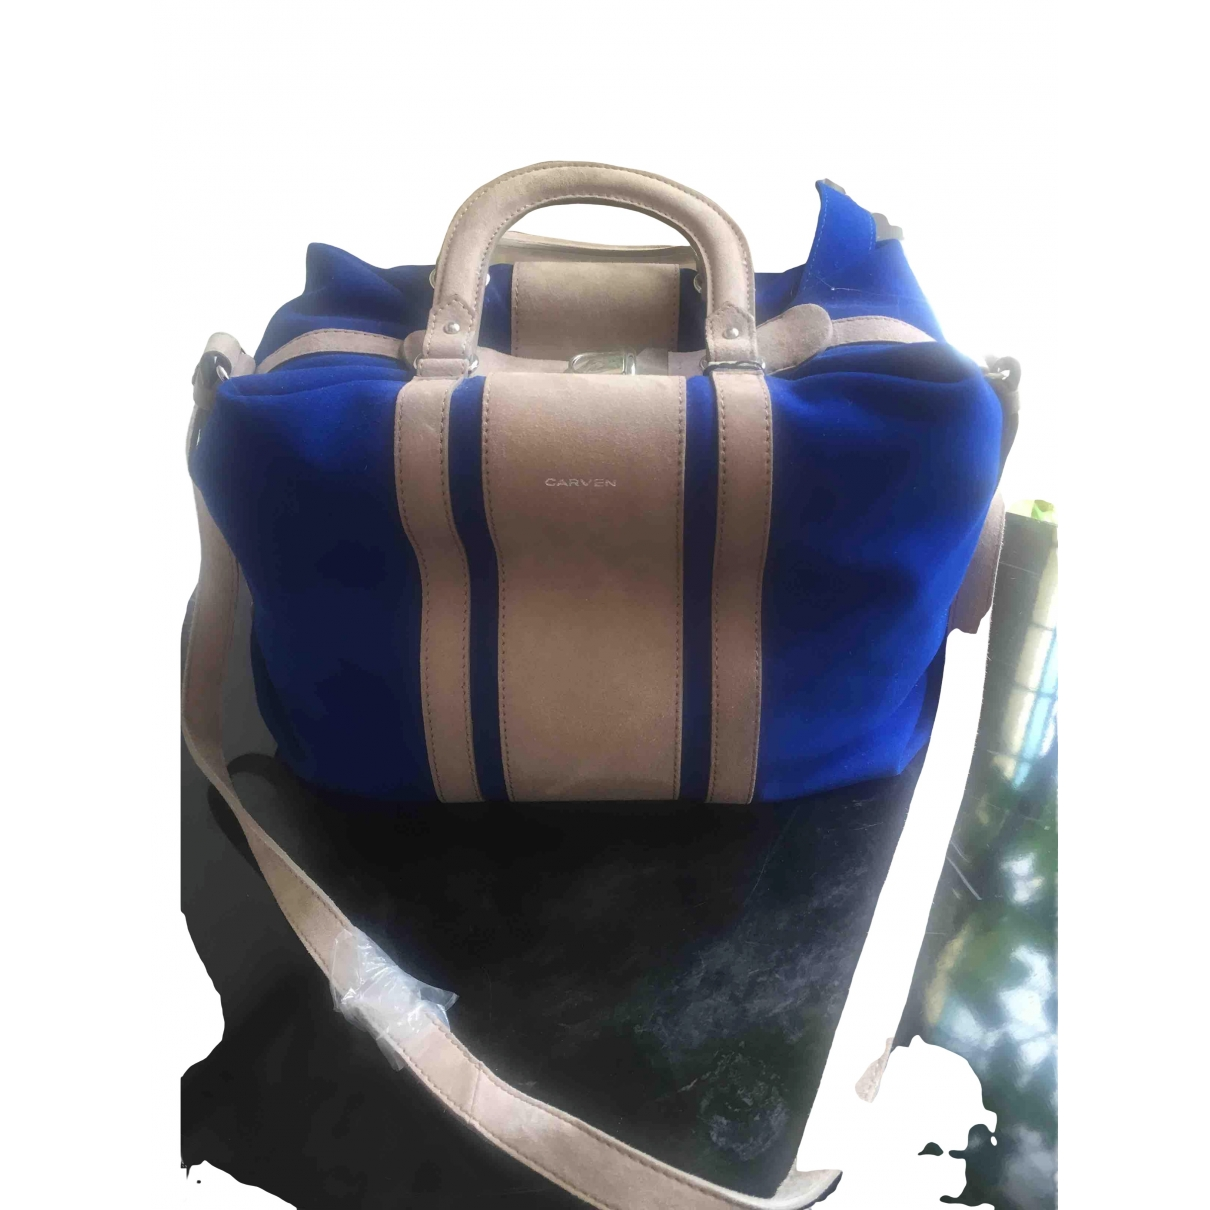 Bolso de mano en Ante Azul Carven